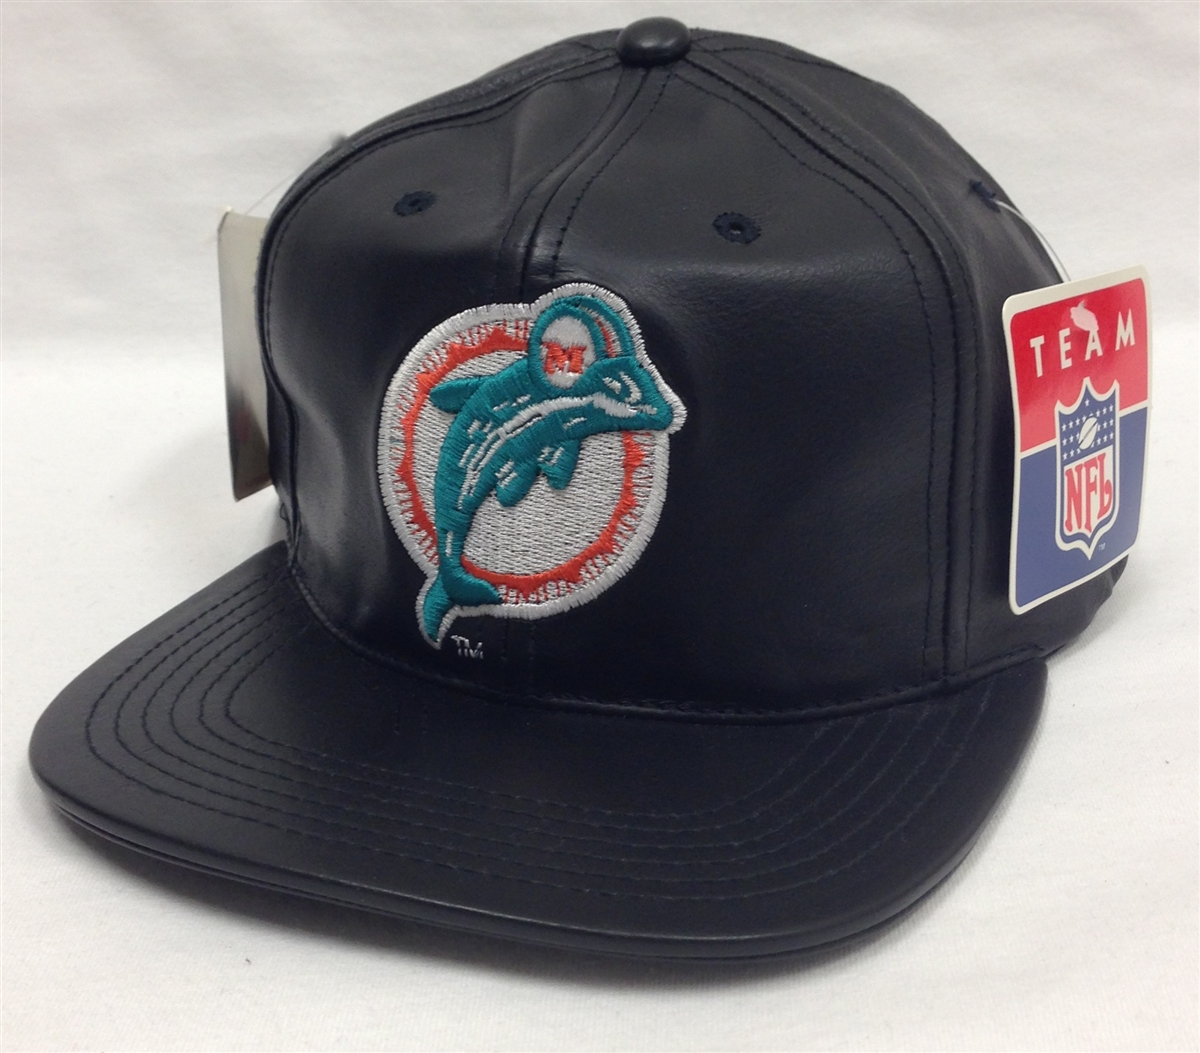 3321e503 Team NFL Miami Dolphins Black Leather Snapback